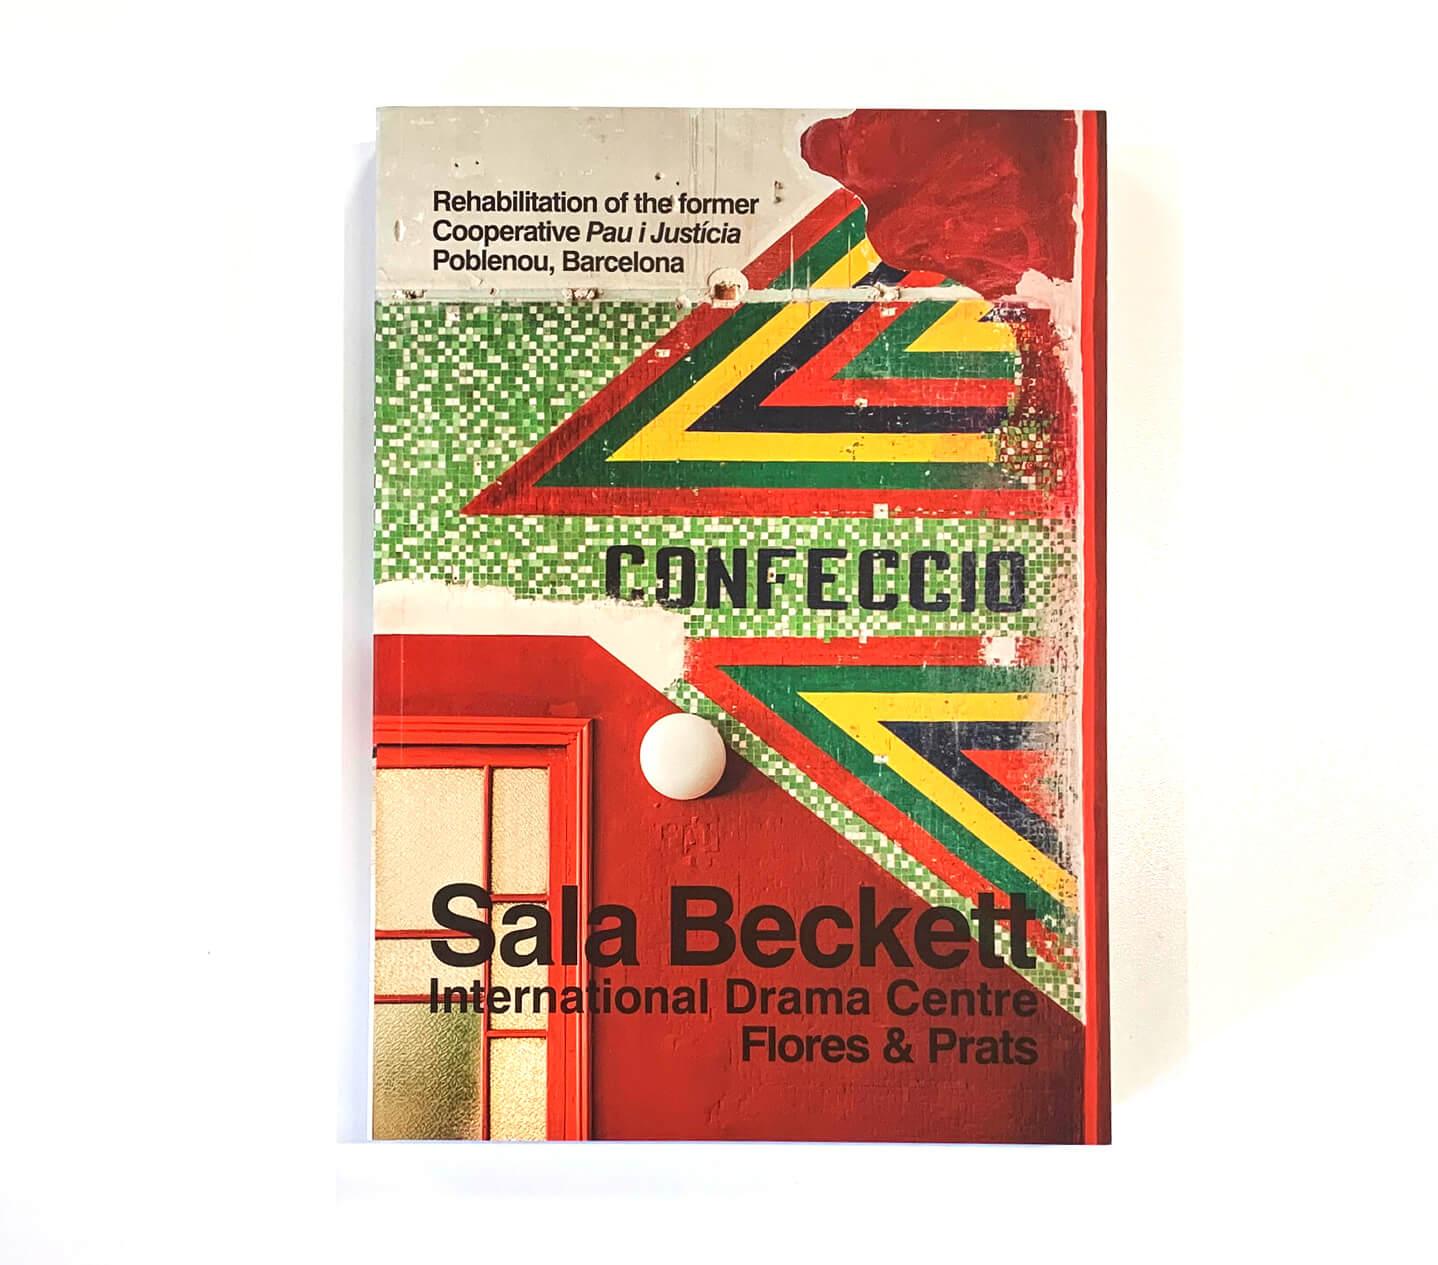 Book cover: International Drama Centre by Flores & Prats, Sala Beckett